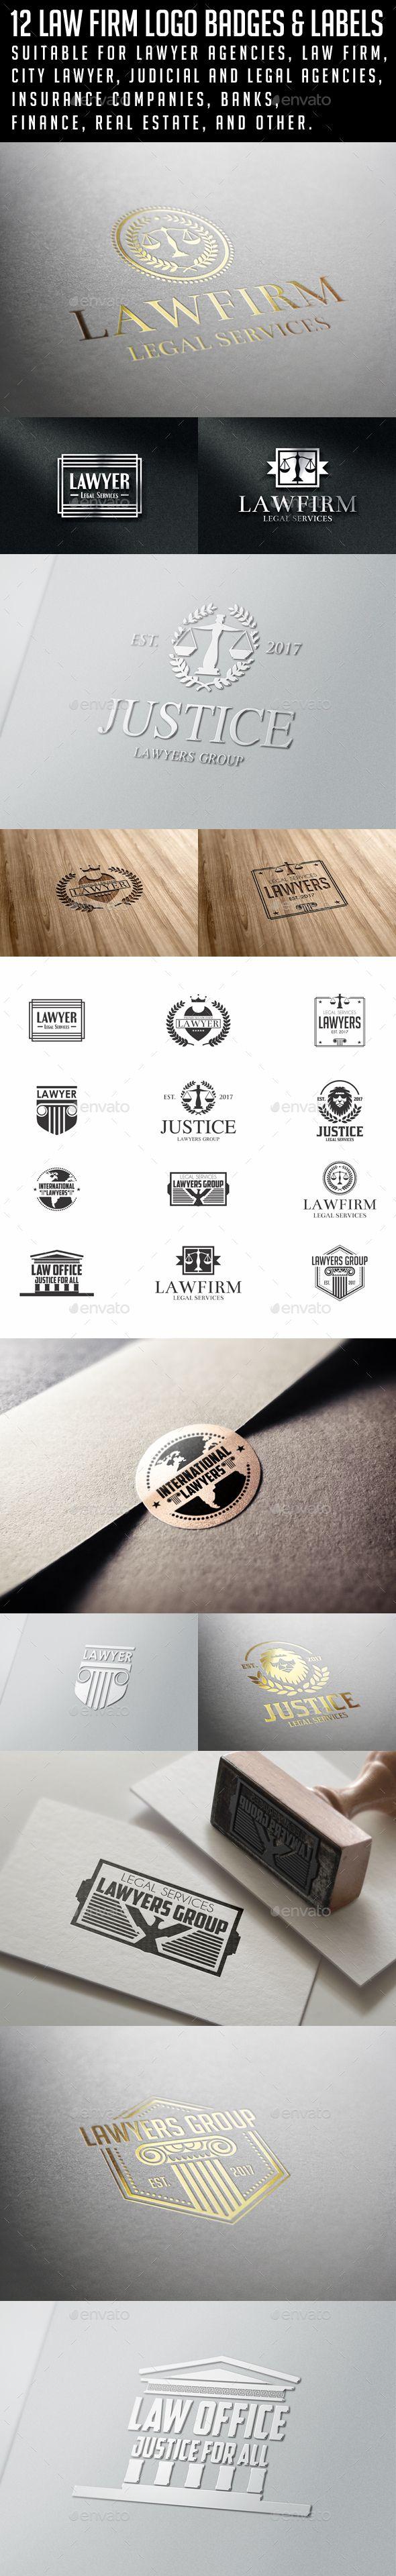 Law Firm Logo Badges Templates Vector EPS, AI Illustrator